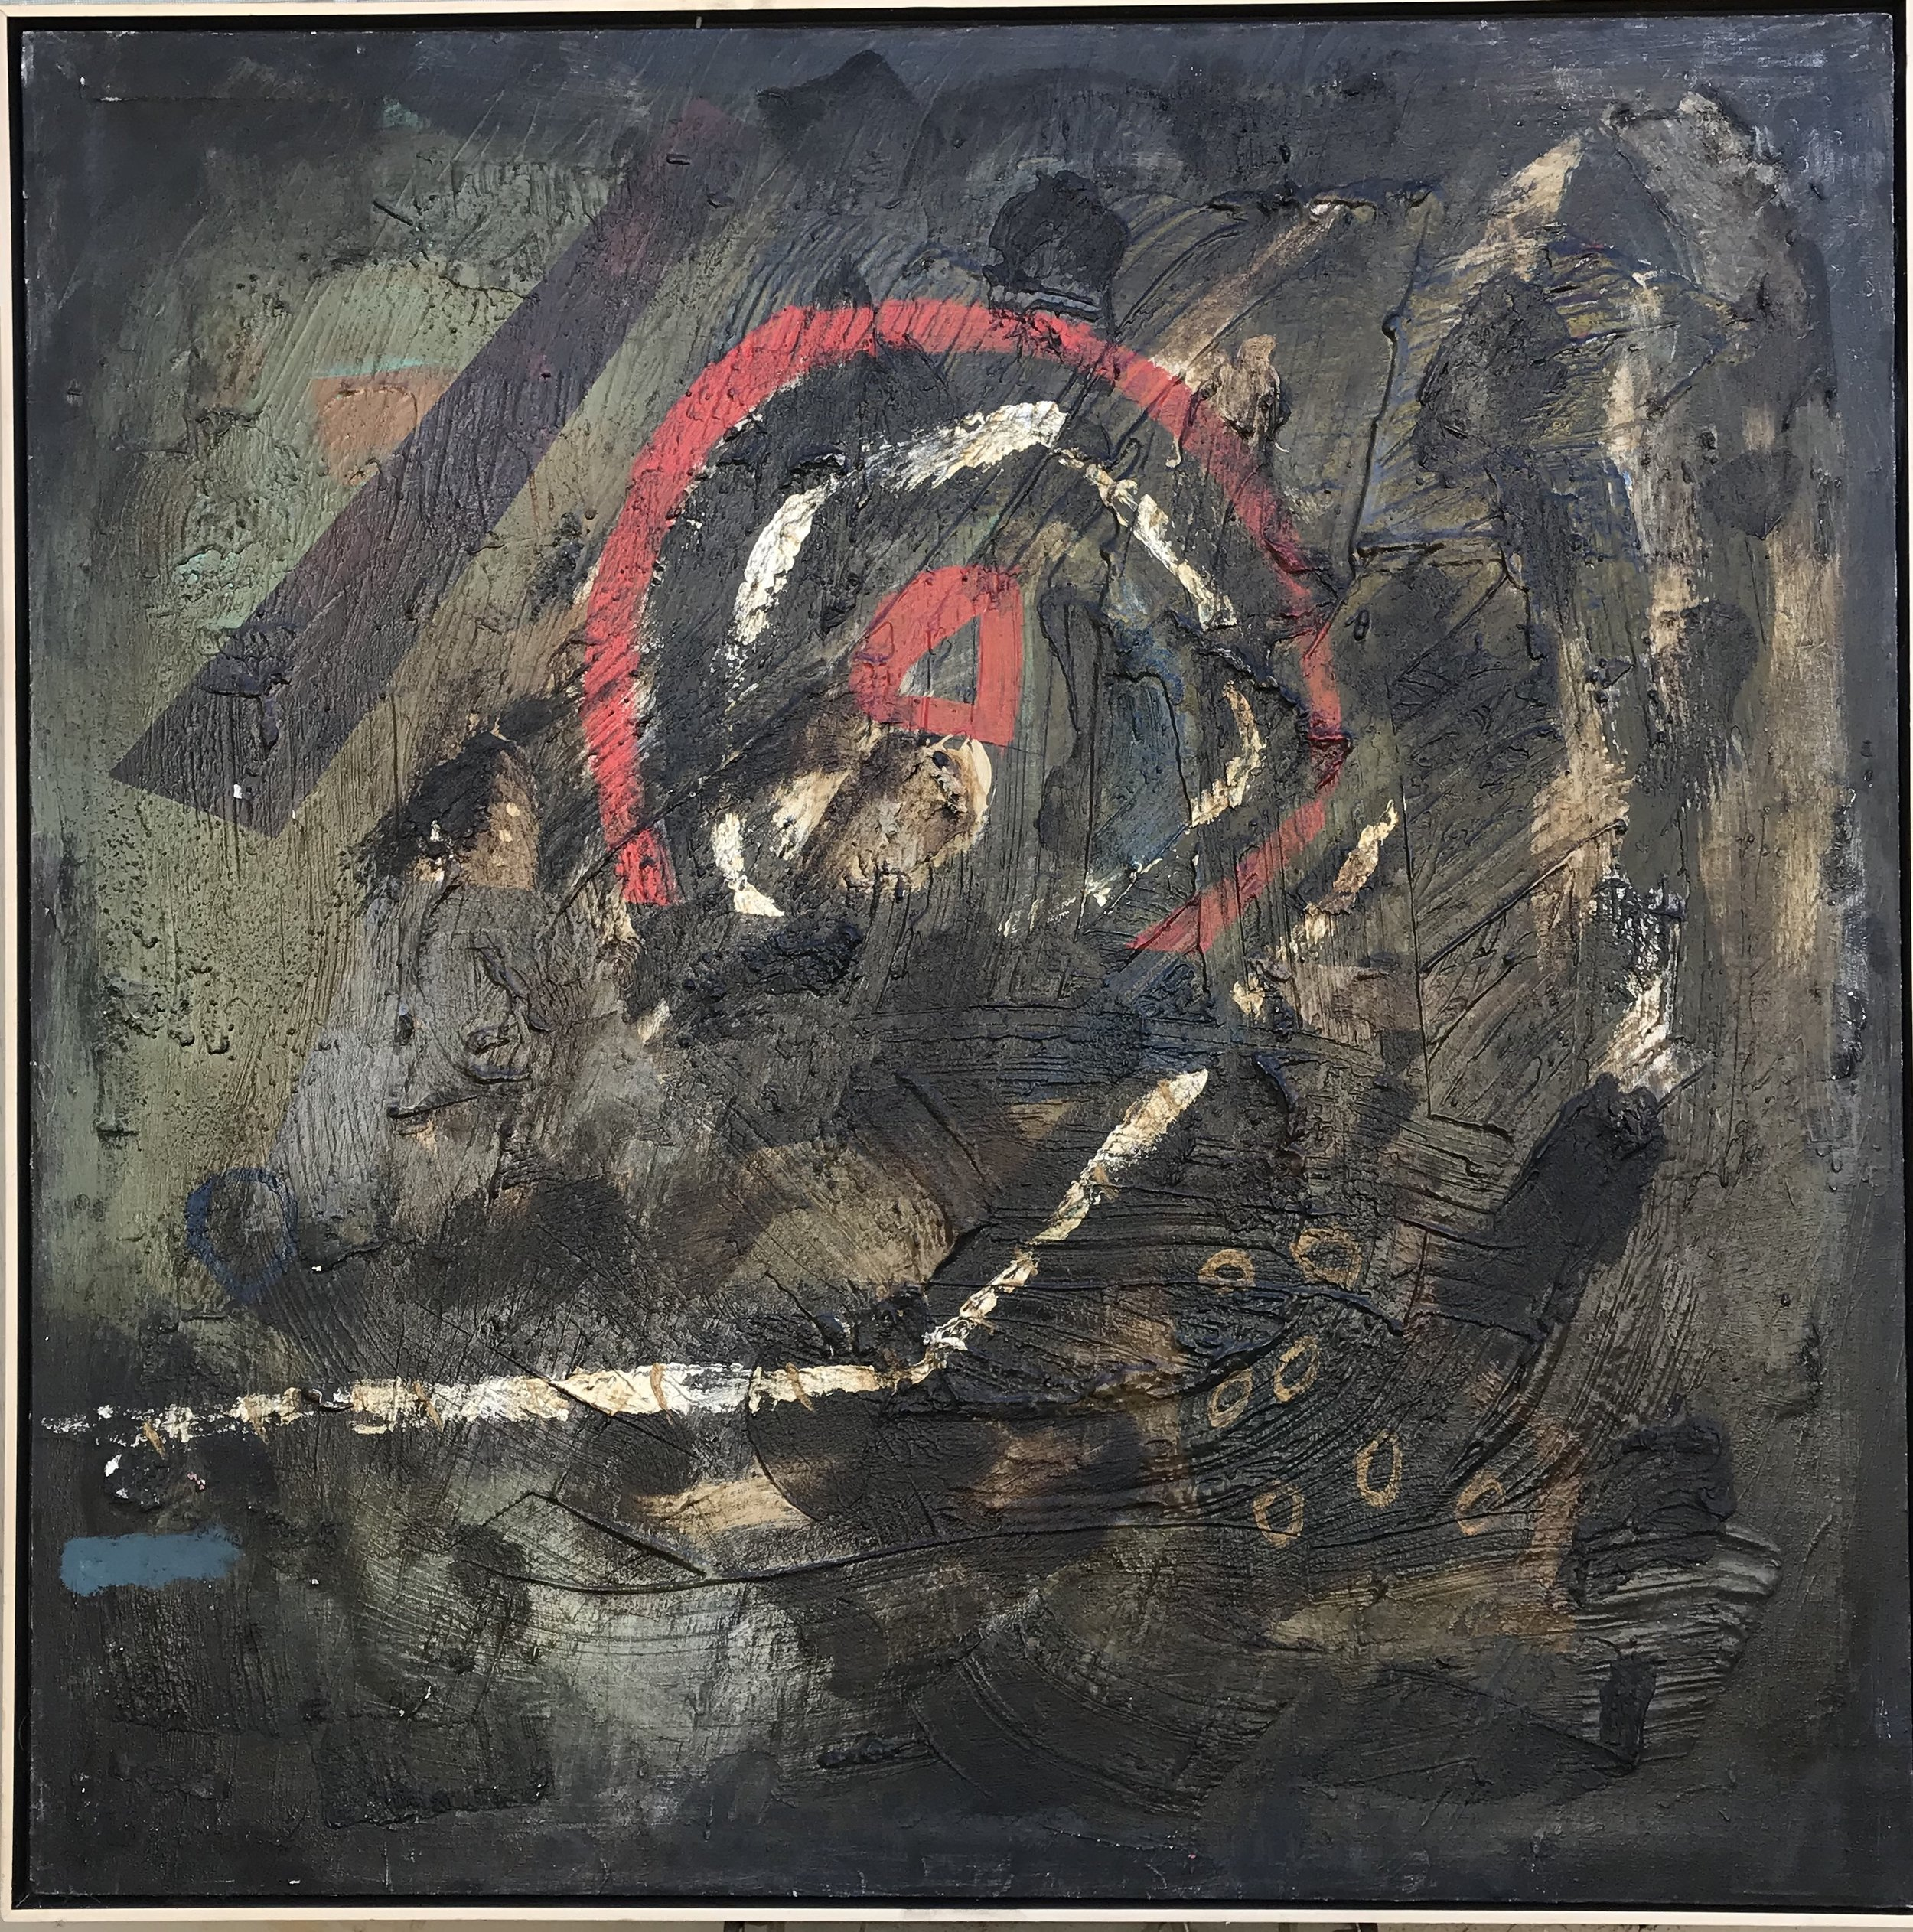 """Bullseye"" - 48"" x 48"" in 2 1/2"" deep floater frame, mixed media on canvasValue: $7,000Opening bid: $2,800email your bid to: art@bradfordbrenner.com"